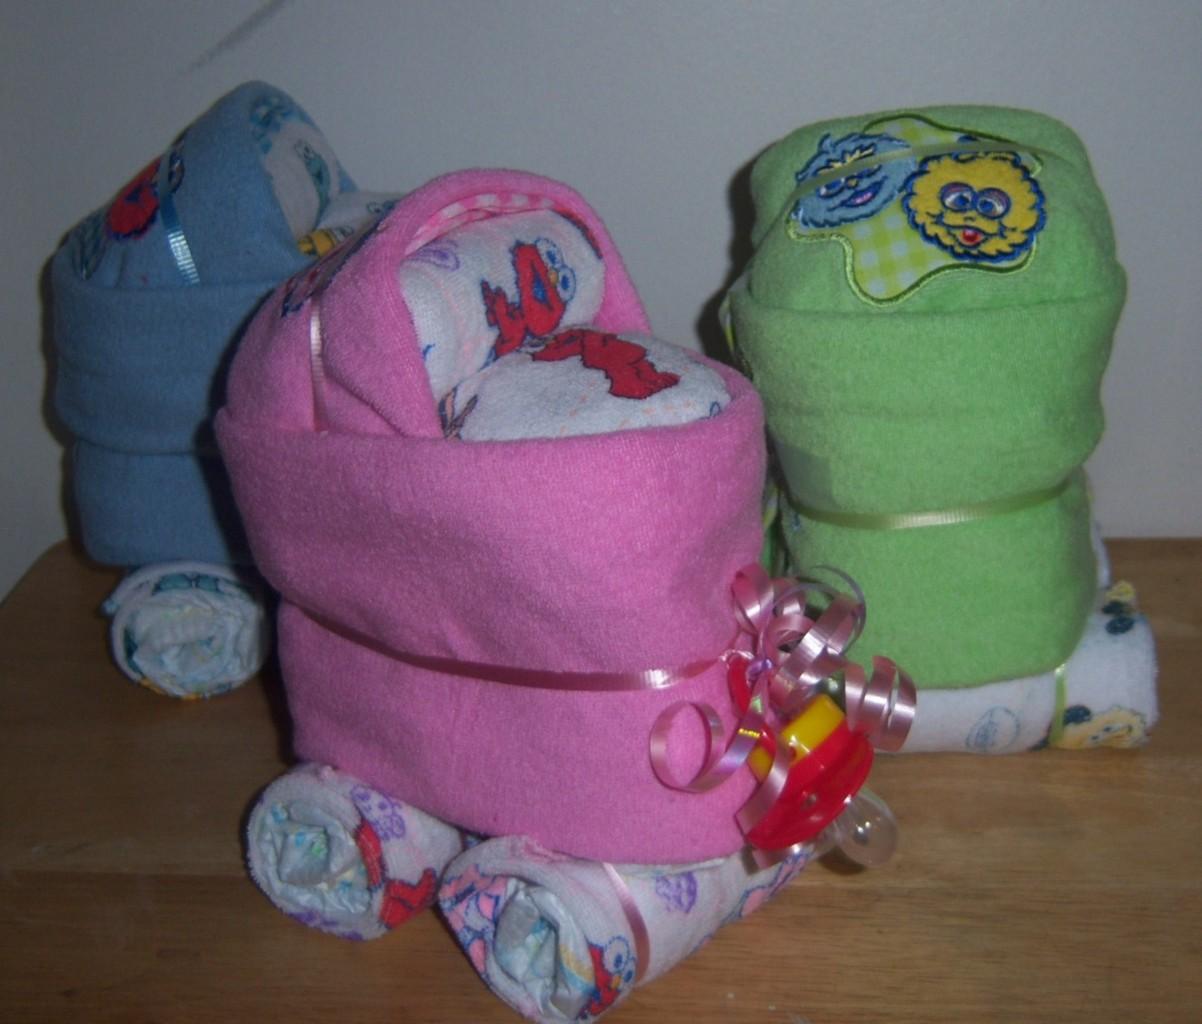 street mini diaper bassinet baby shower elmo big bird cookie monster